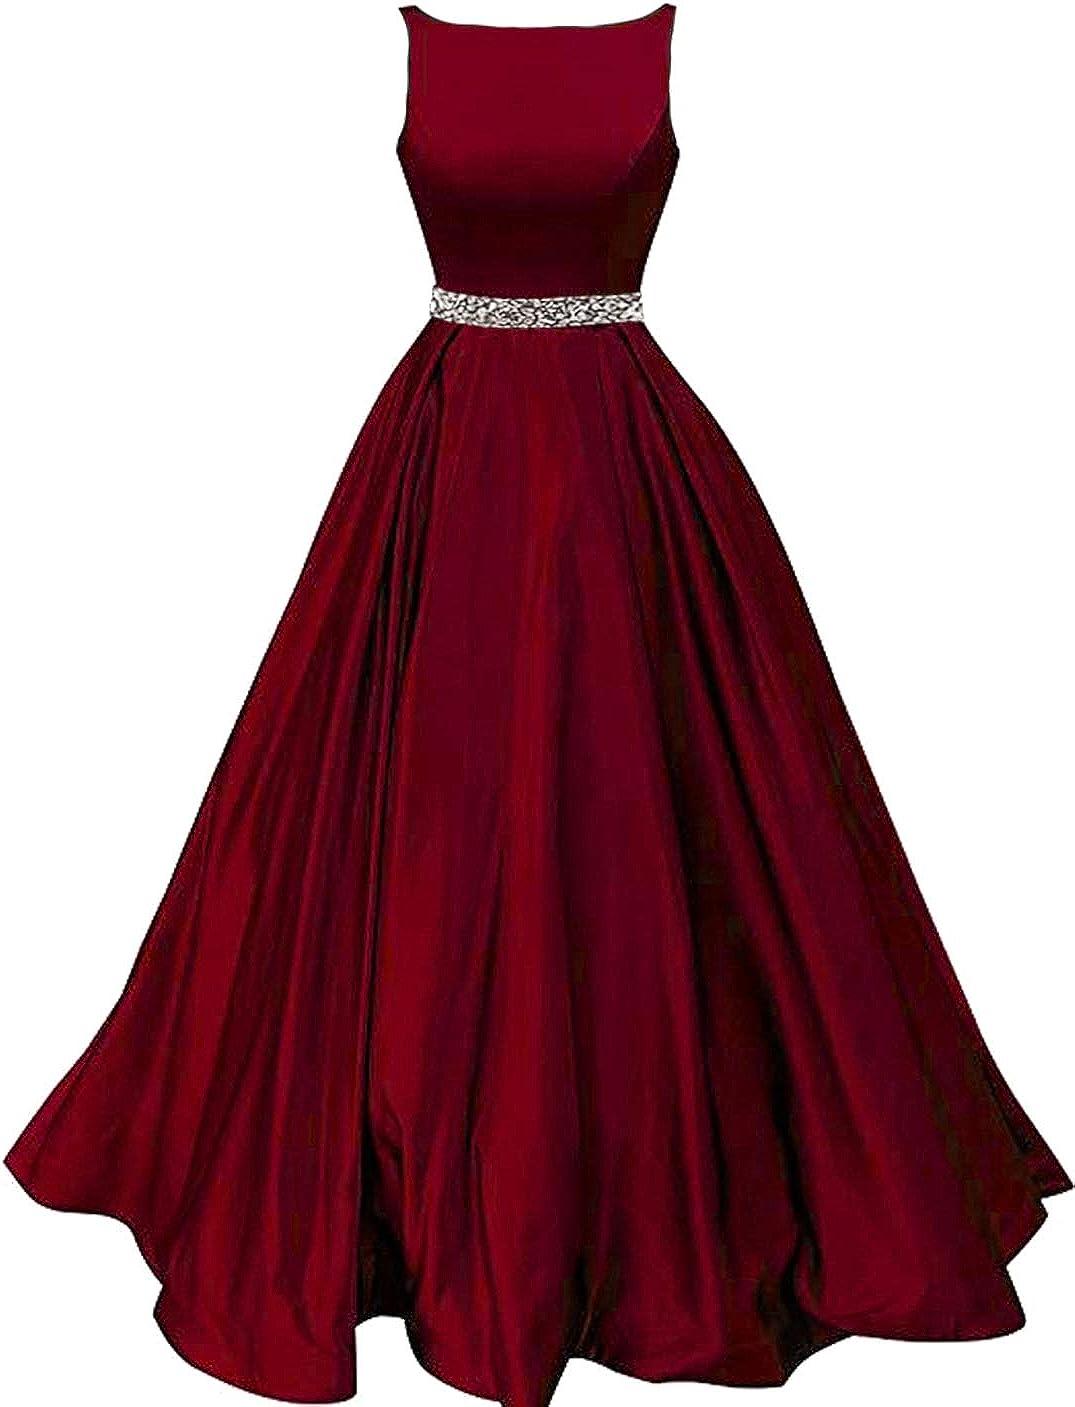 Bobi Bridal Women's A-Line Prom Dress With Pockets Satin Belt Evening Gowns Long